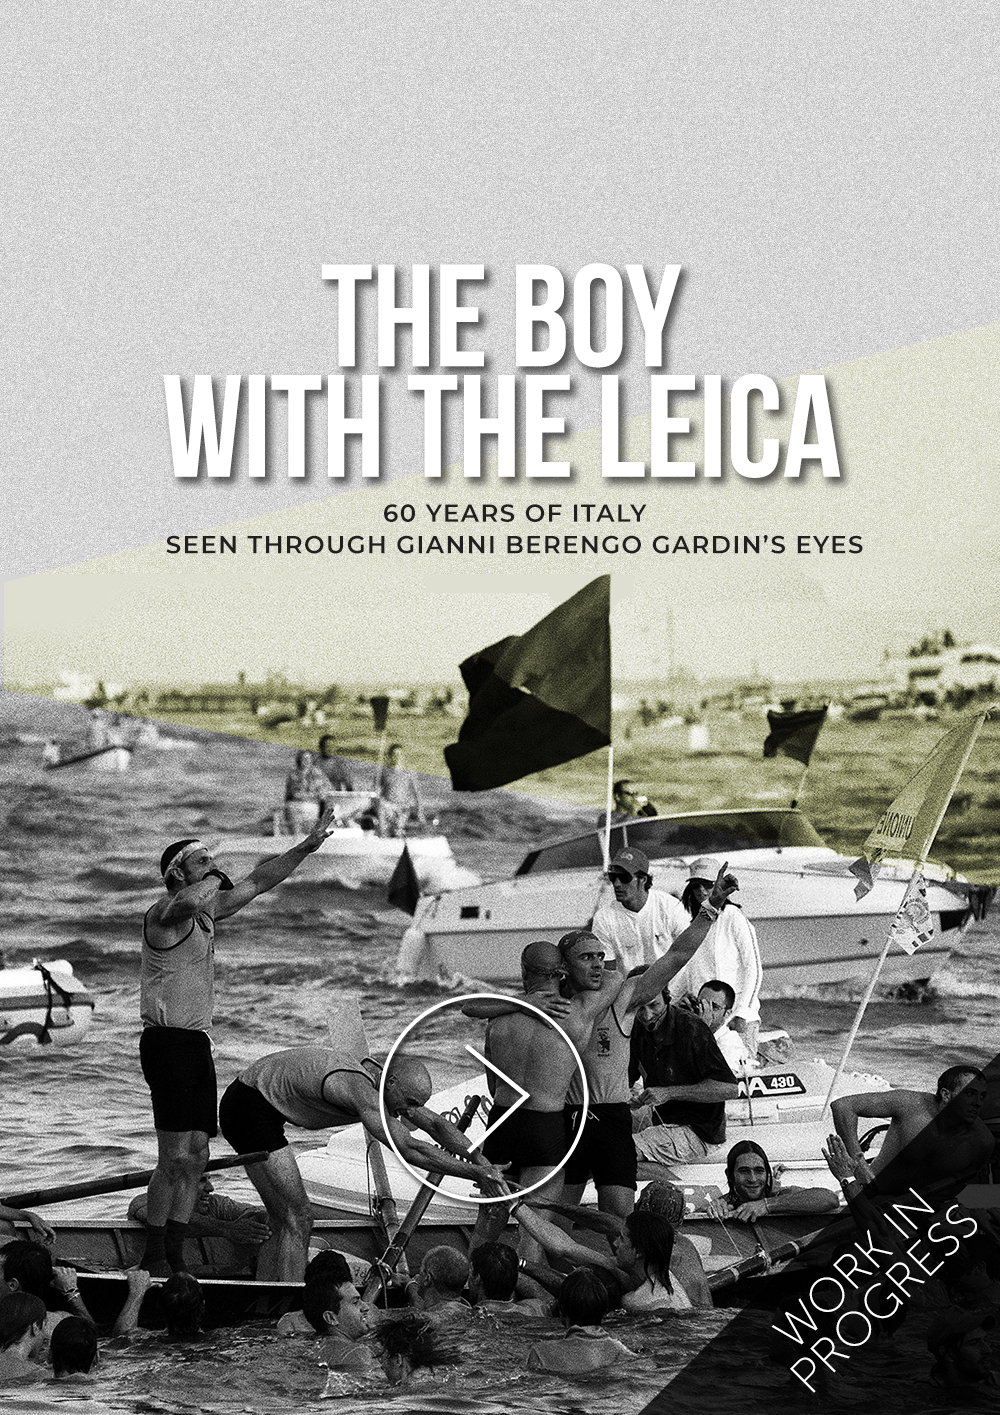 The Boy with the Leica Talpa Produzioni